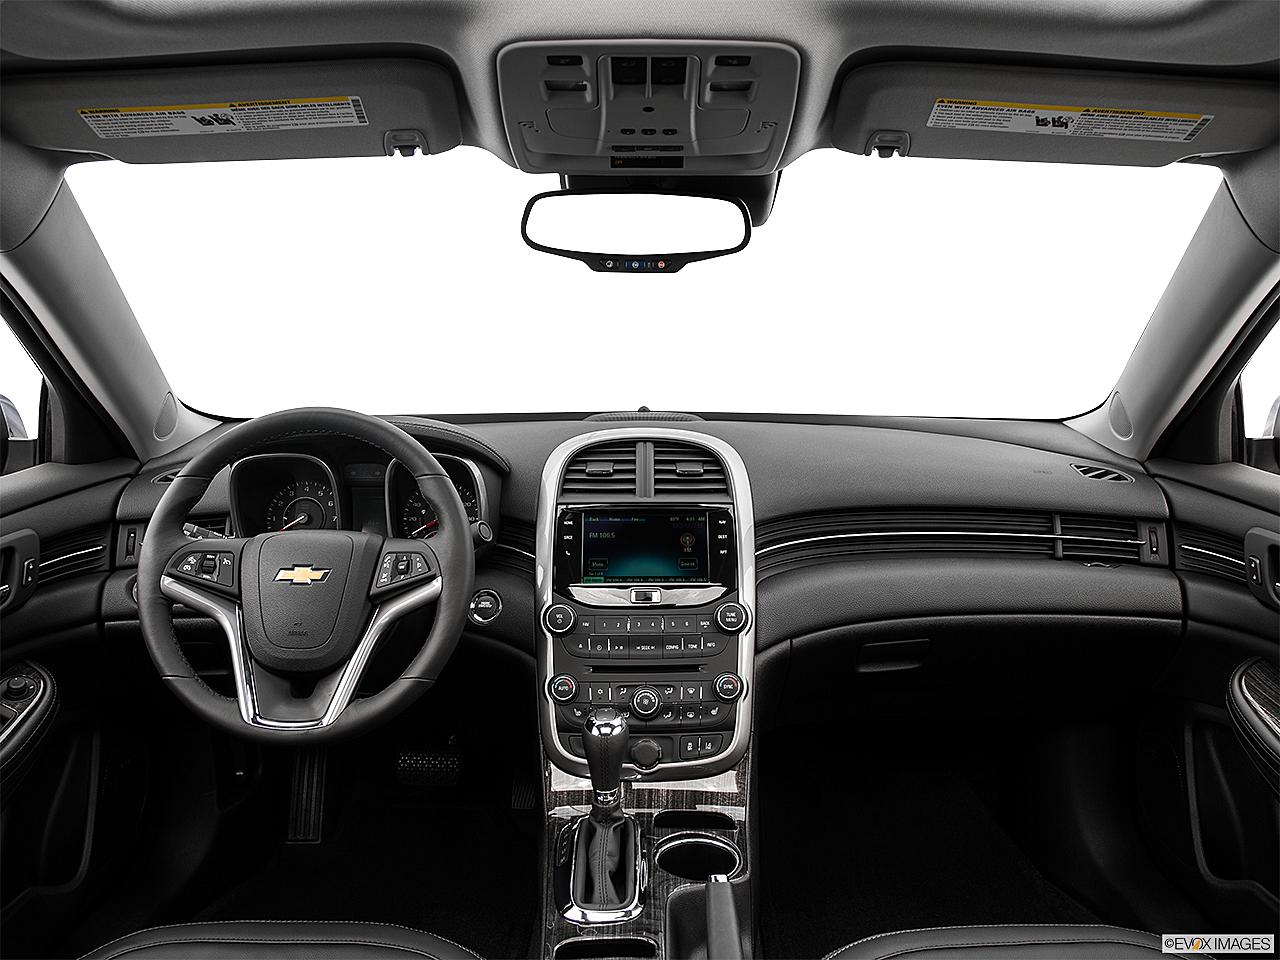 2015 chevrolet malibu ltz 4dr sedan w 1lz research groovecar. Black Bedroom Furniture Sets. Home Design Ideas